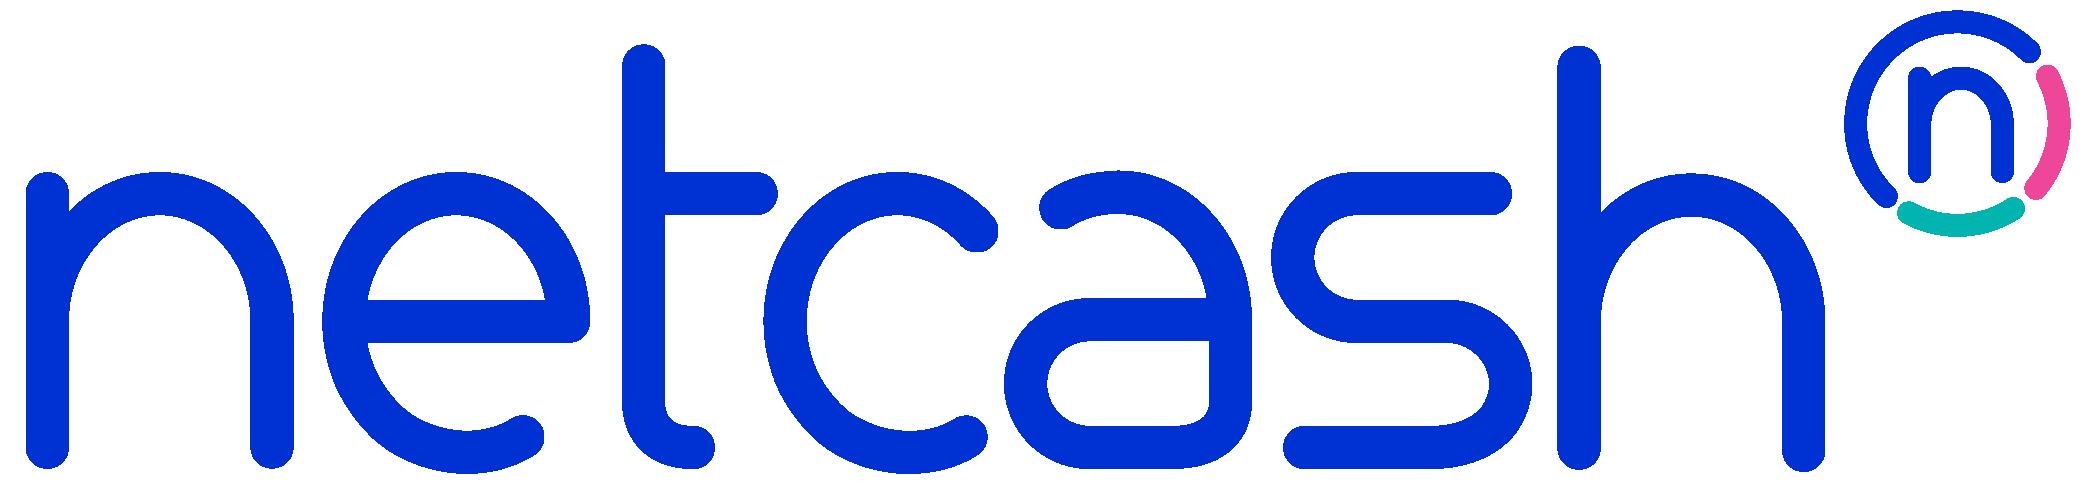 Netcash (South Africa)